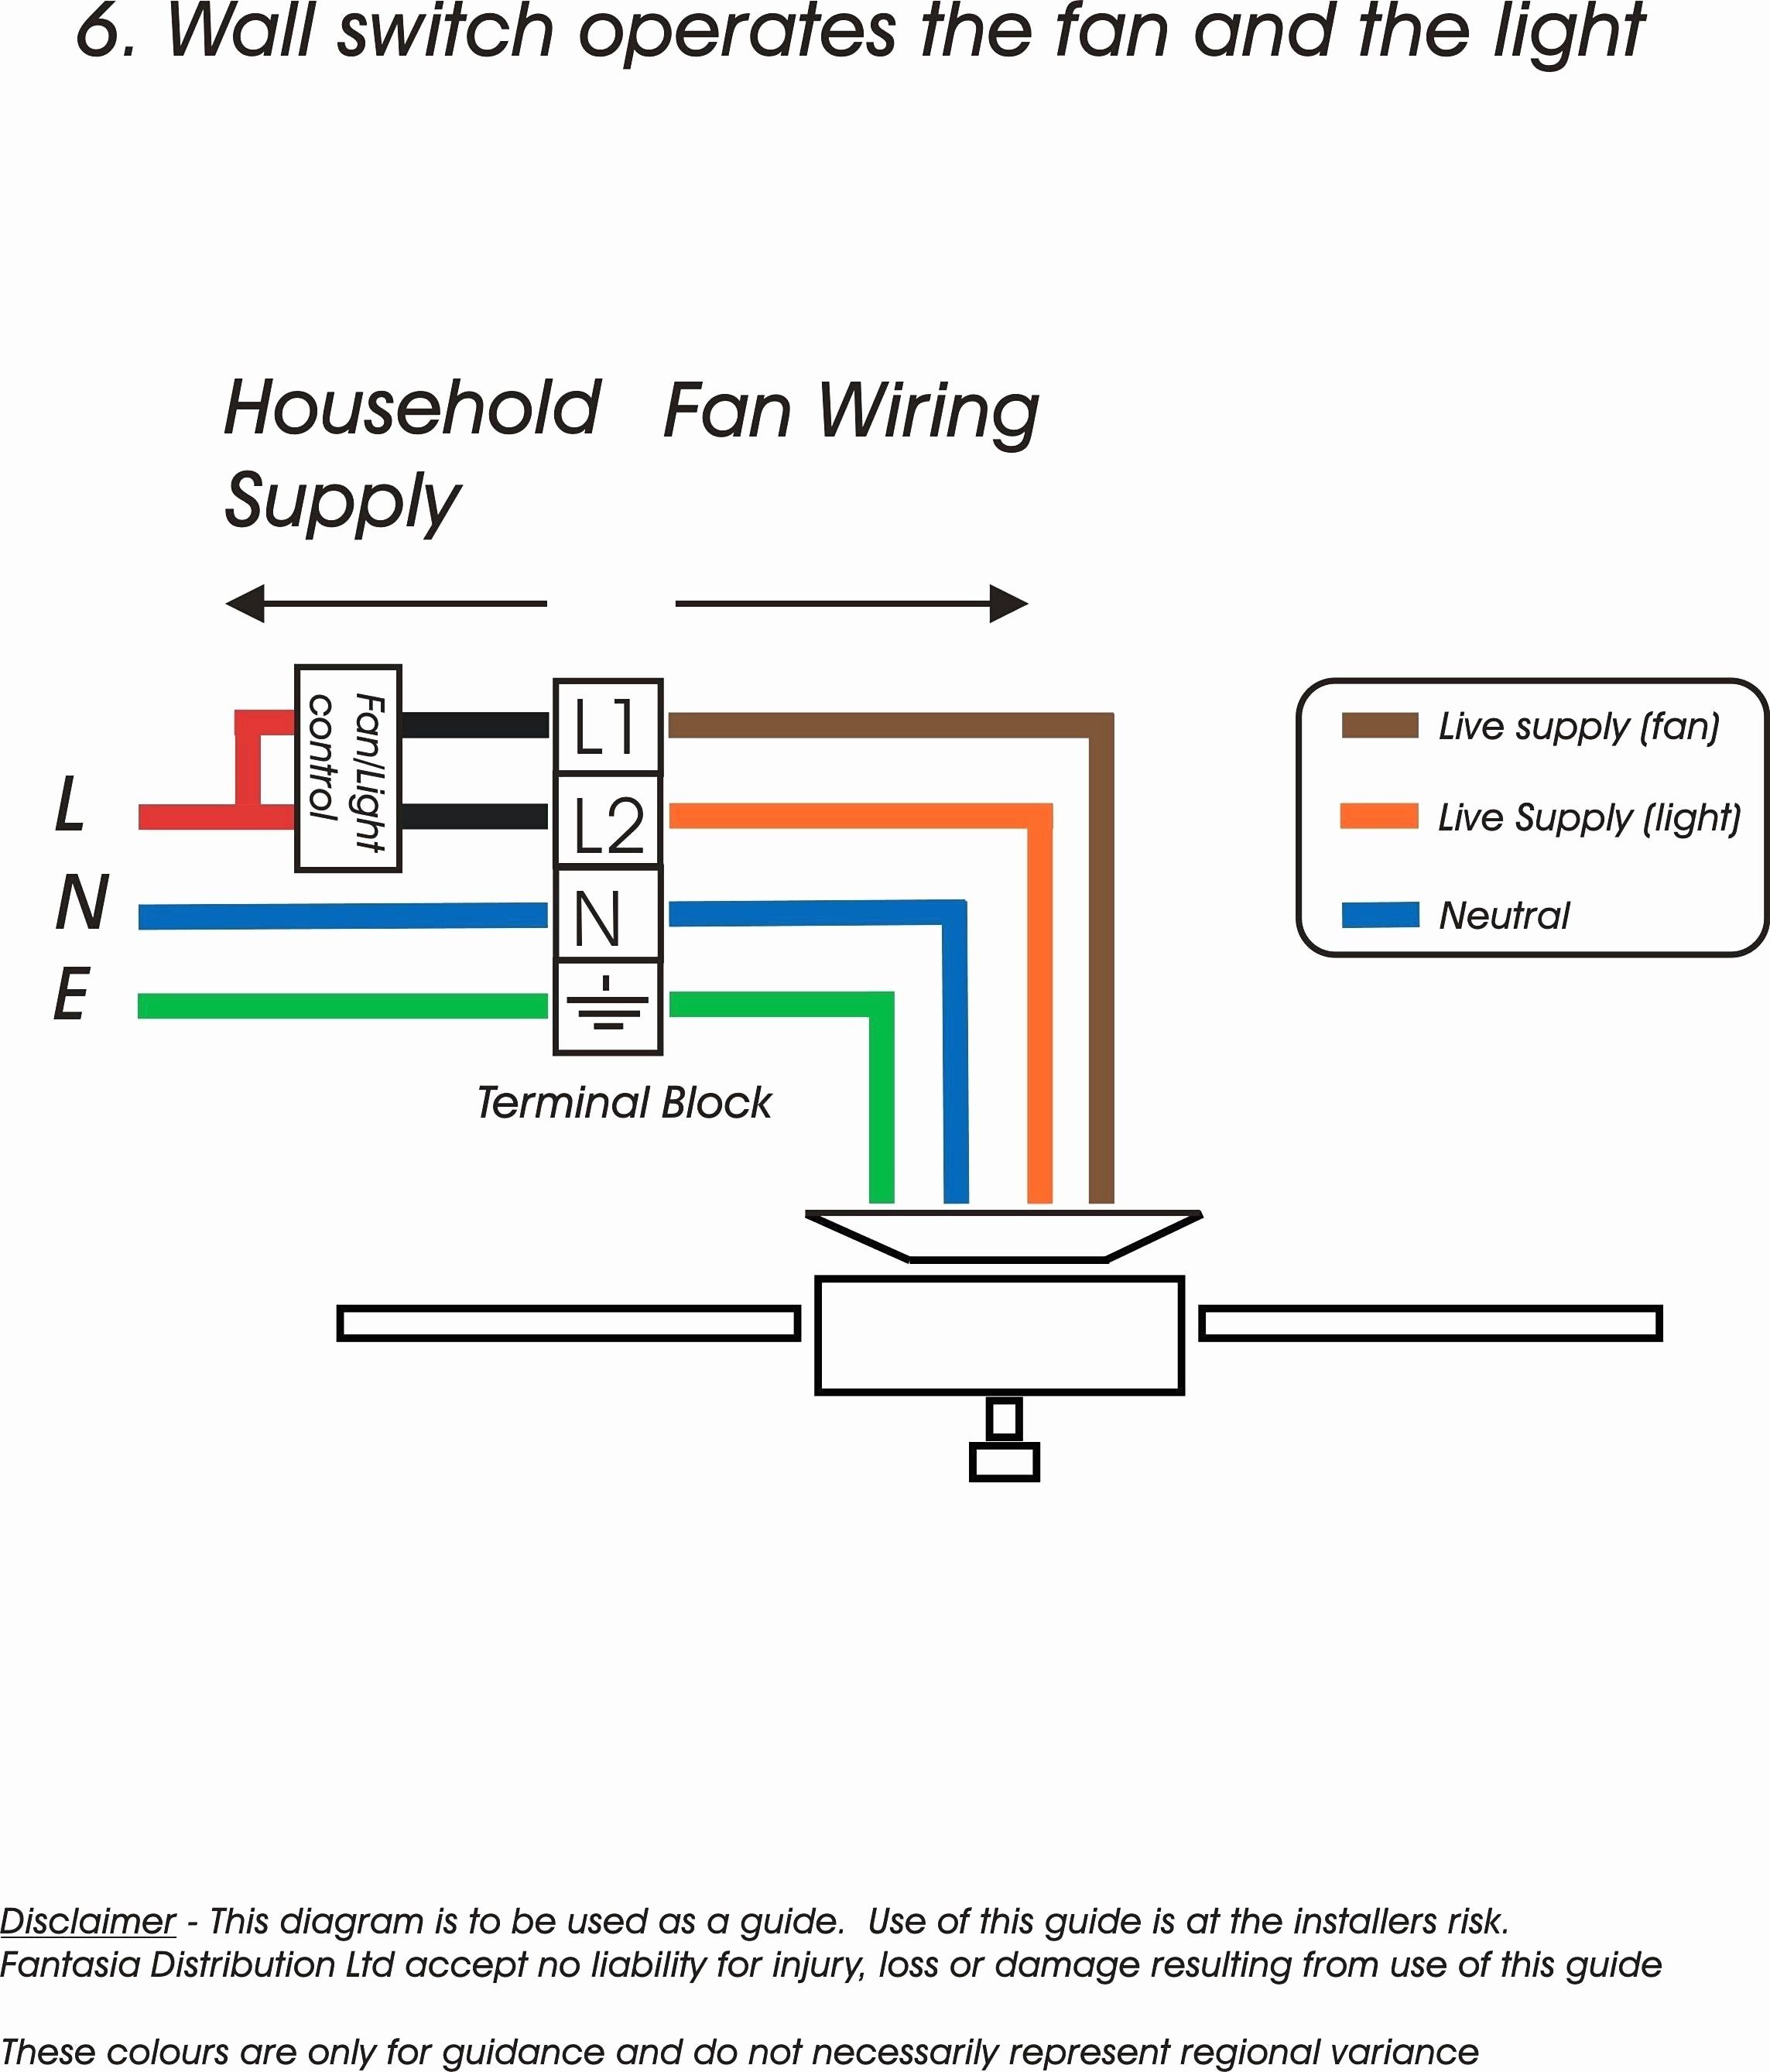 Emergency Ballast Wiring Diagram 50 Luxury Aircraft Emergency Lighting System Of Emergency Ballast Wiring Diagram